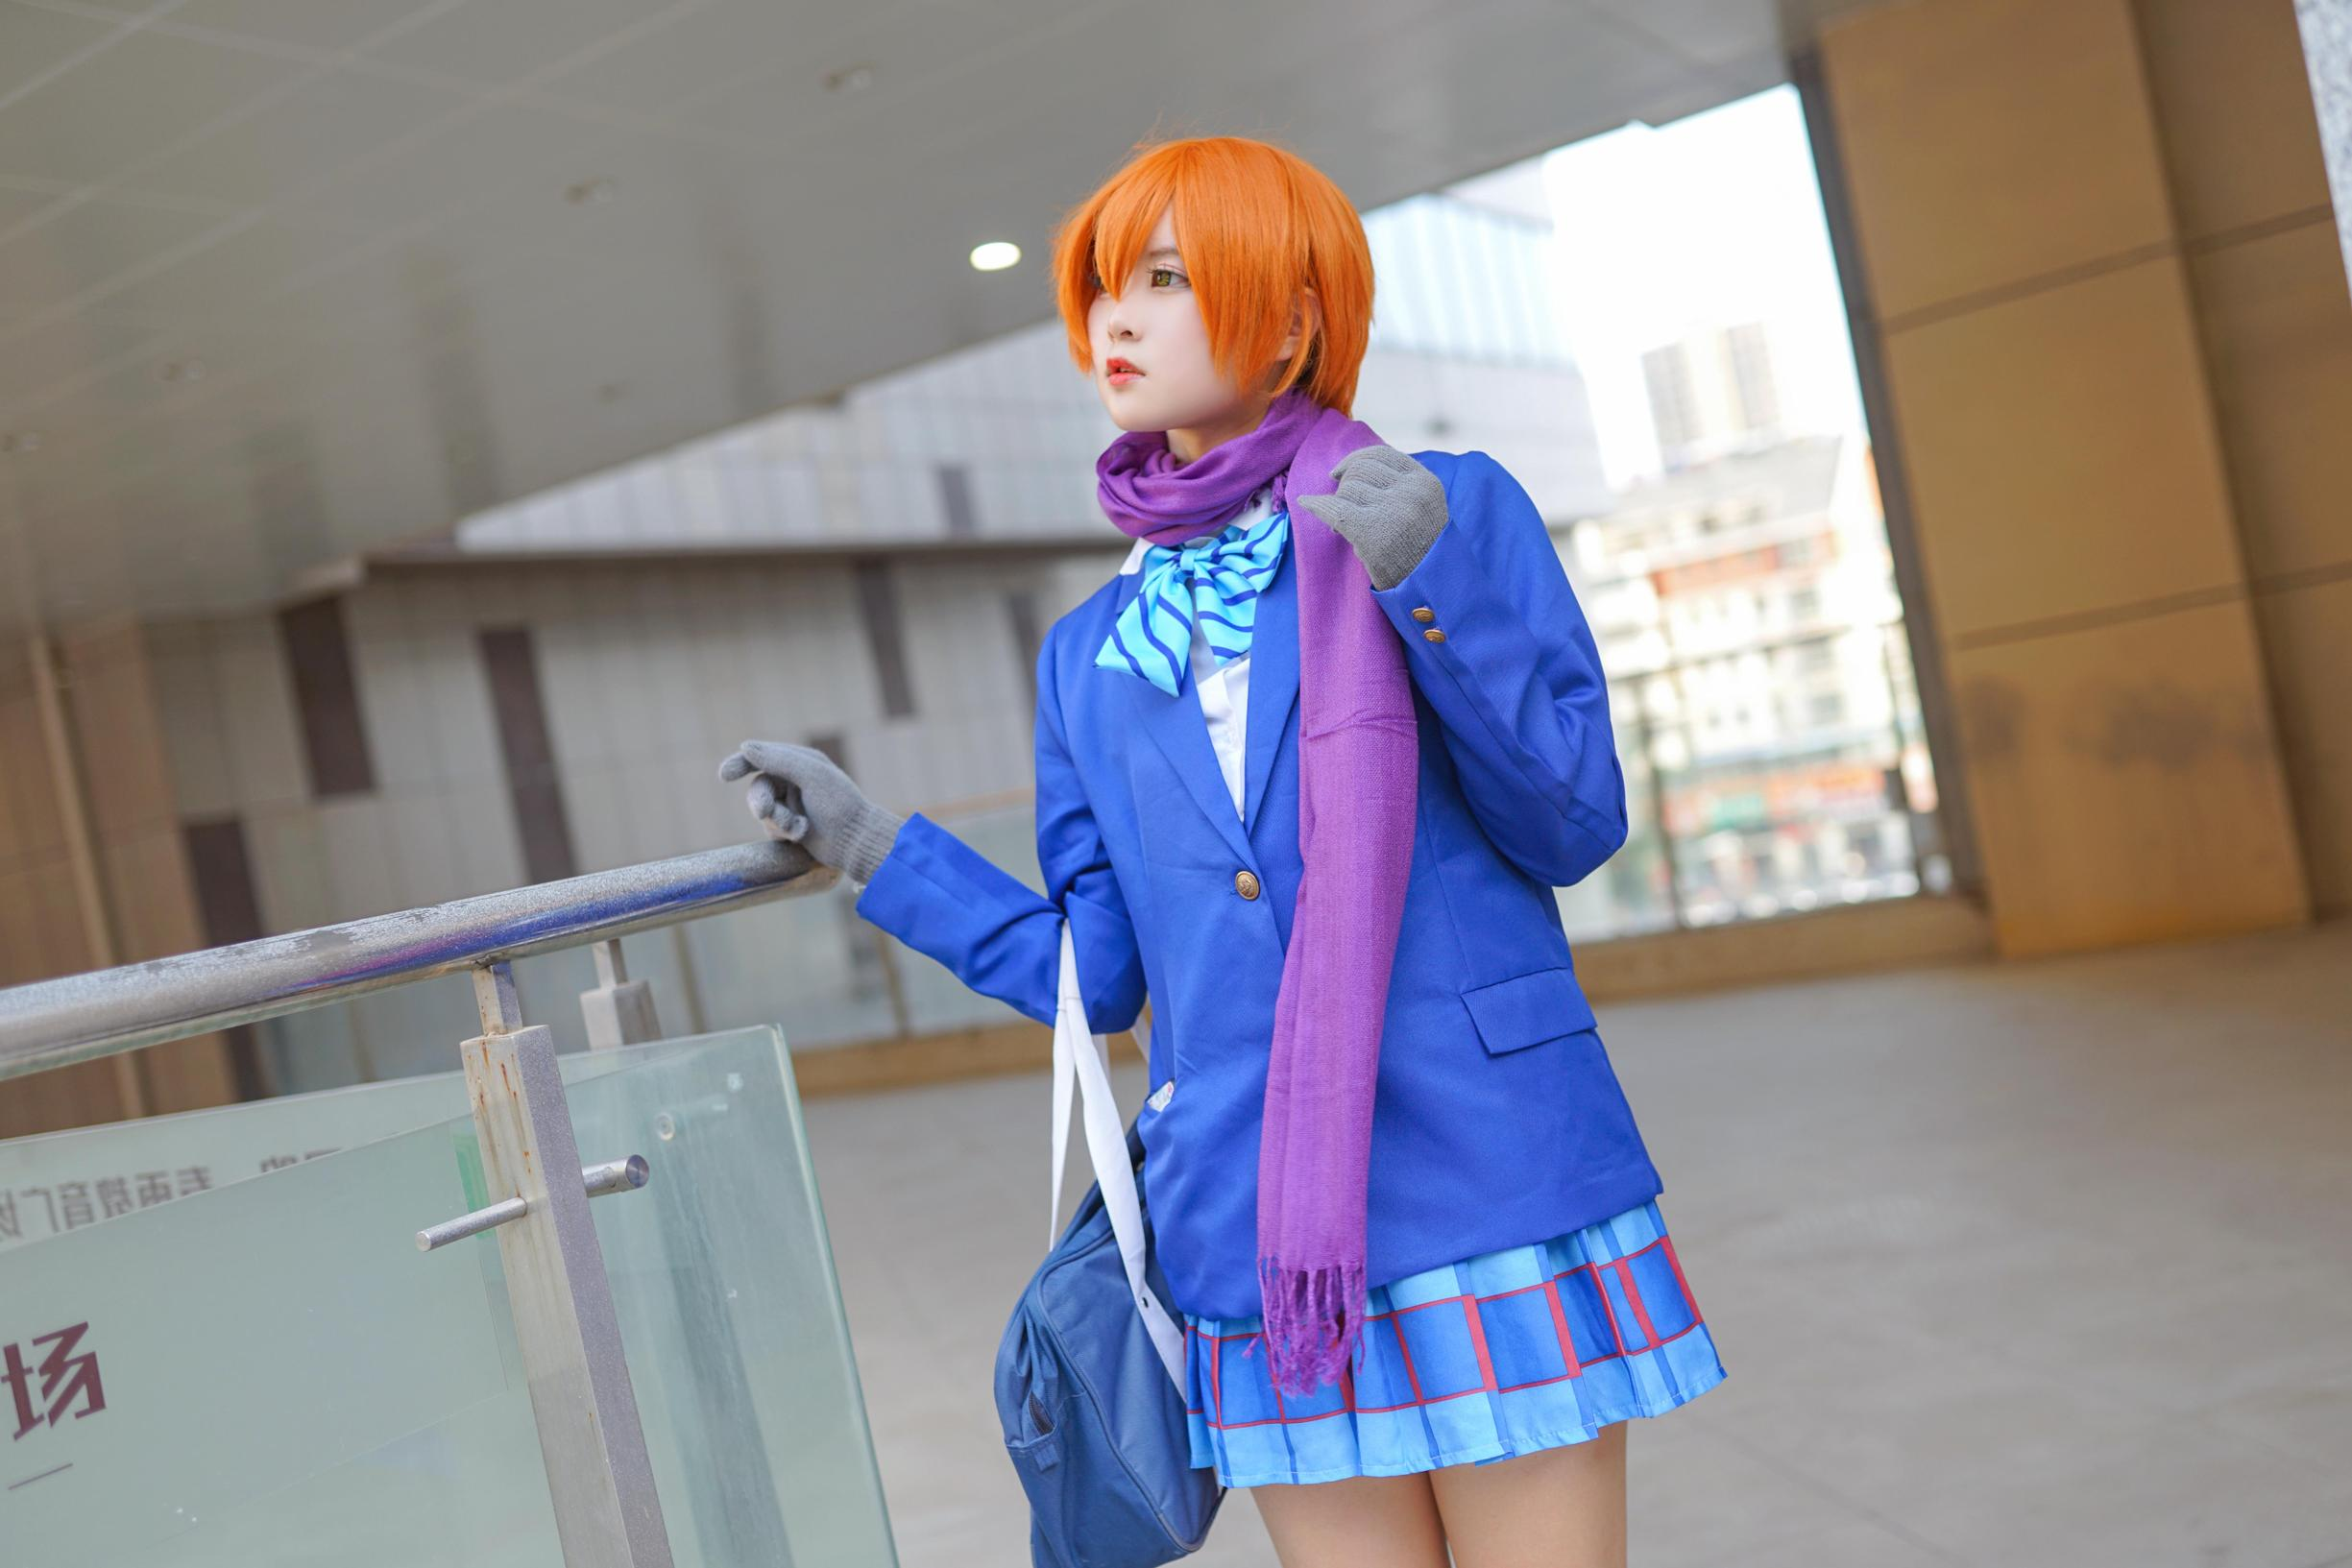 《LOVE LIVE!》美少女cosplay【CN:_李笑颜Lee】-第11张